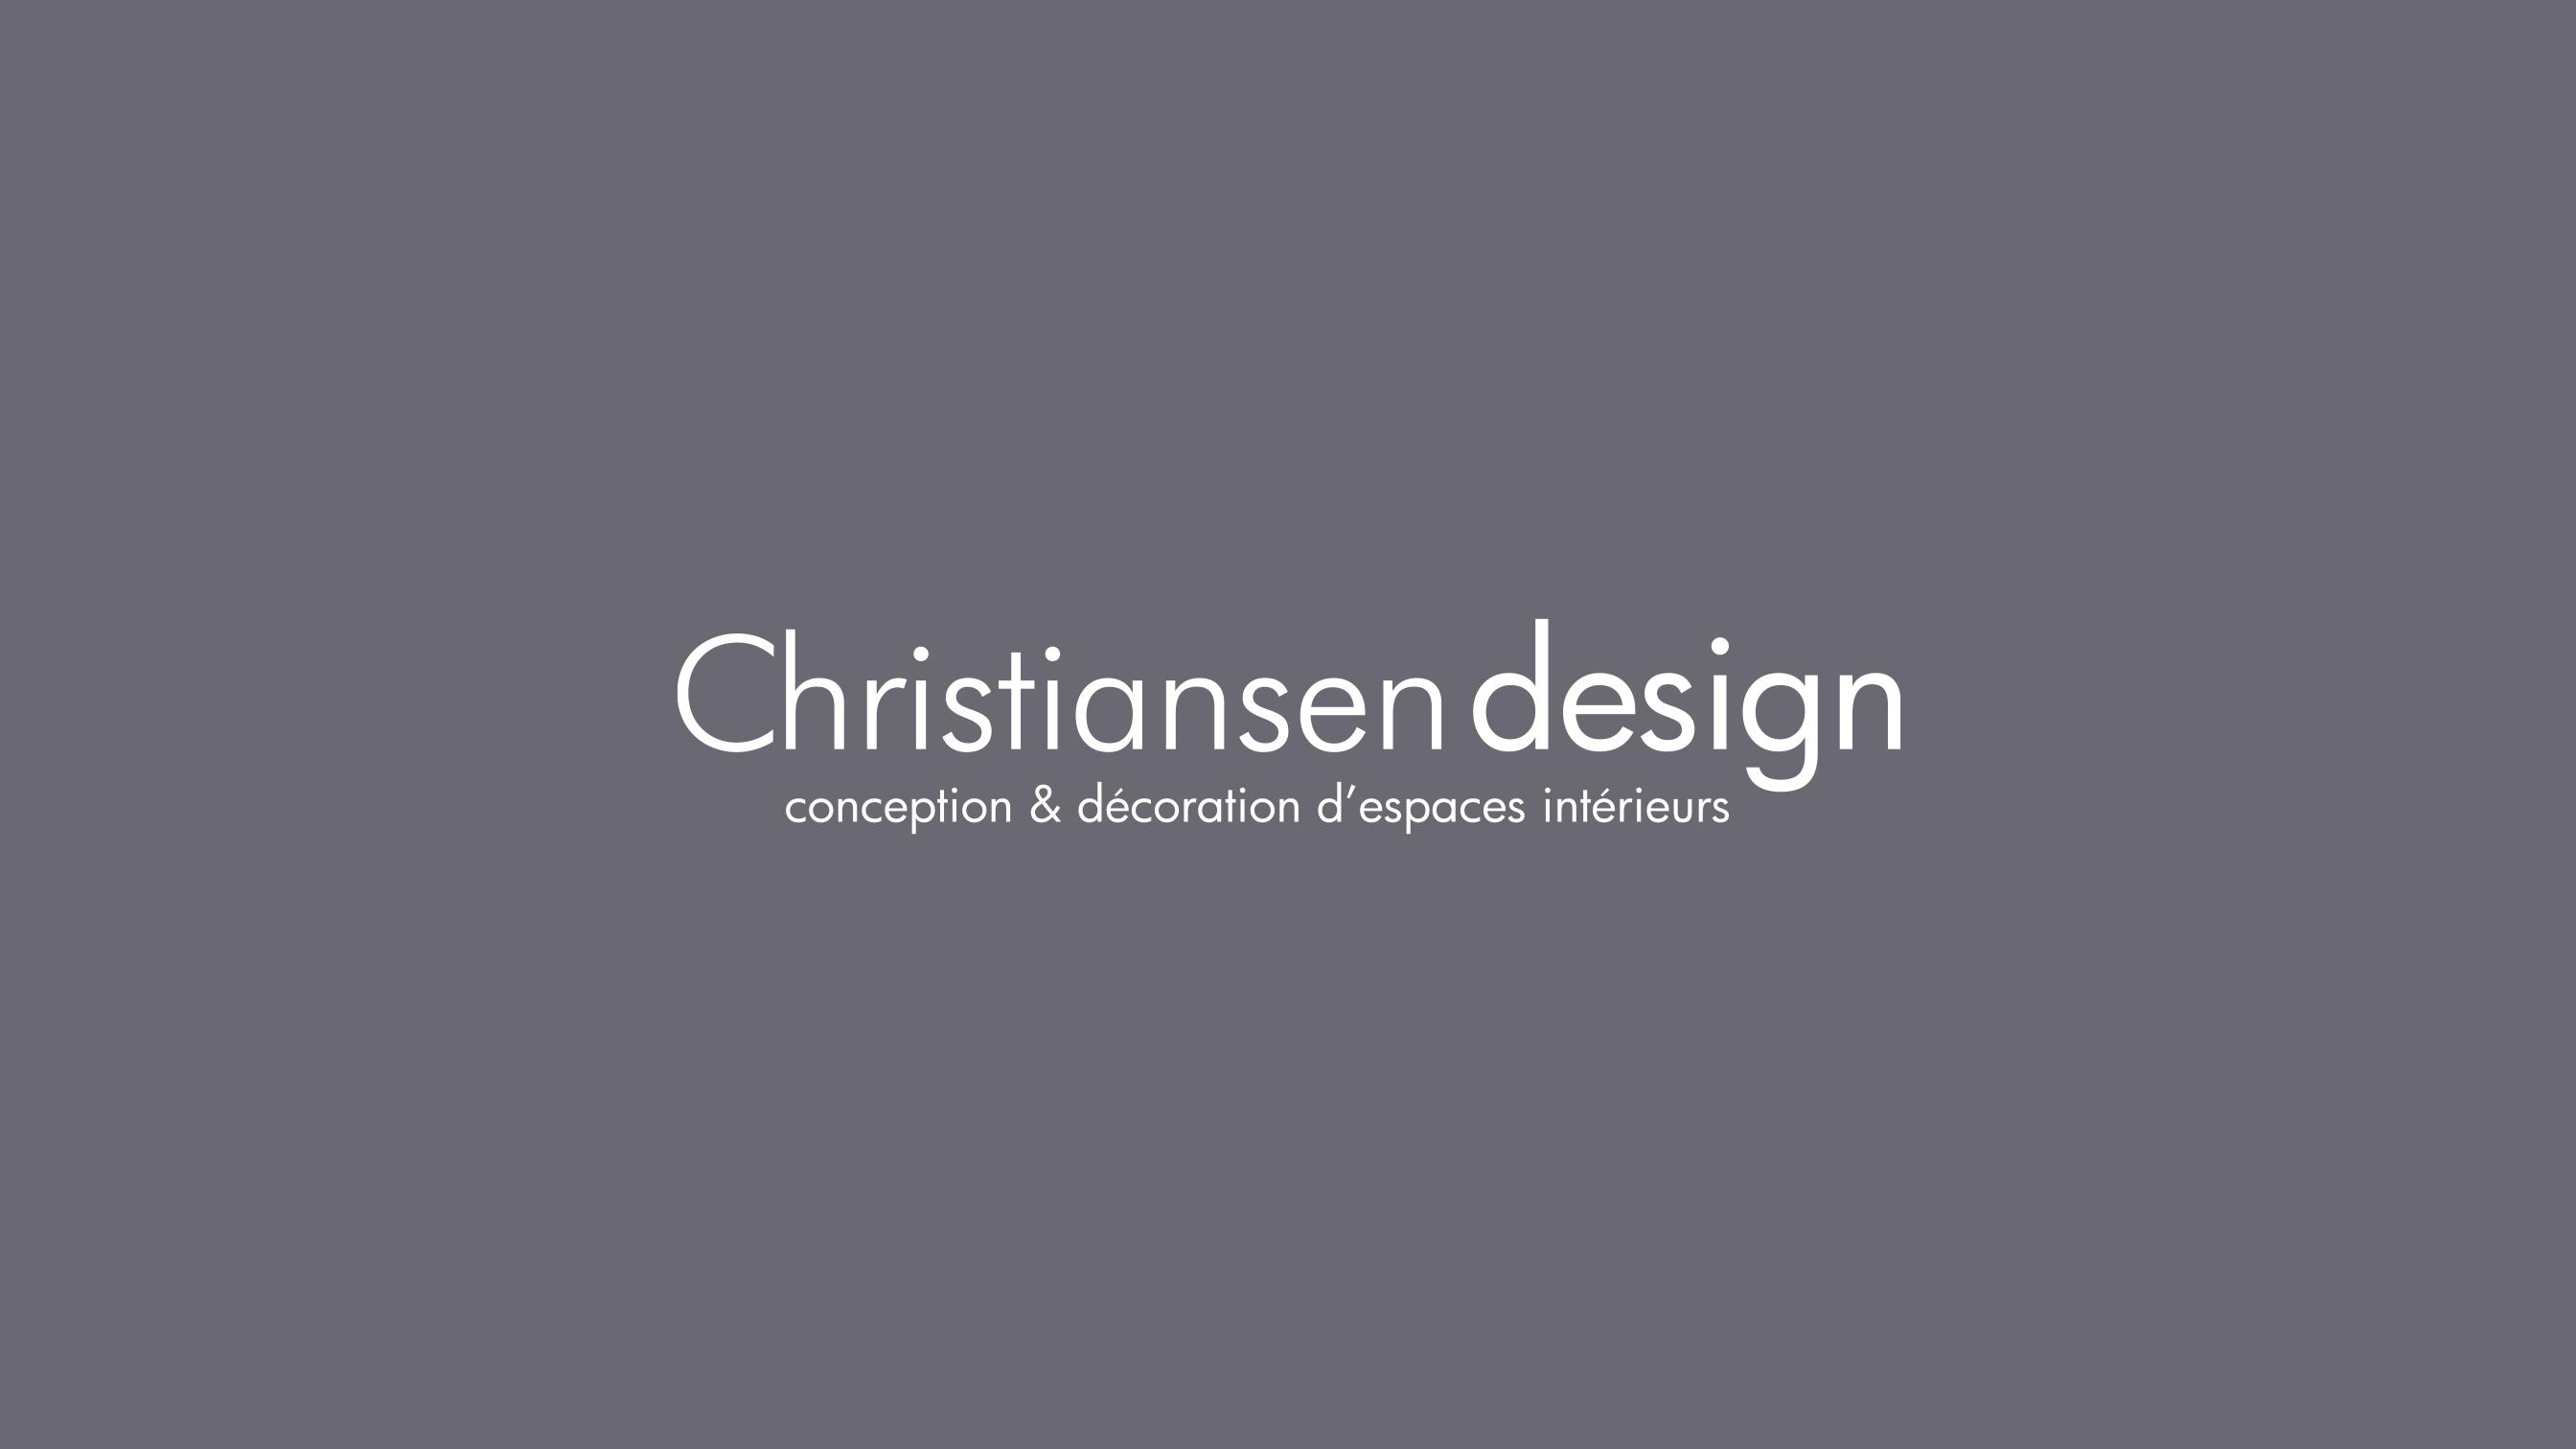 christiansendesign-logotype-pikteo